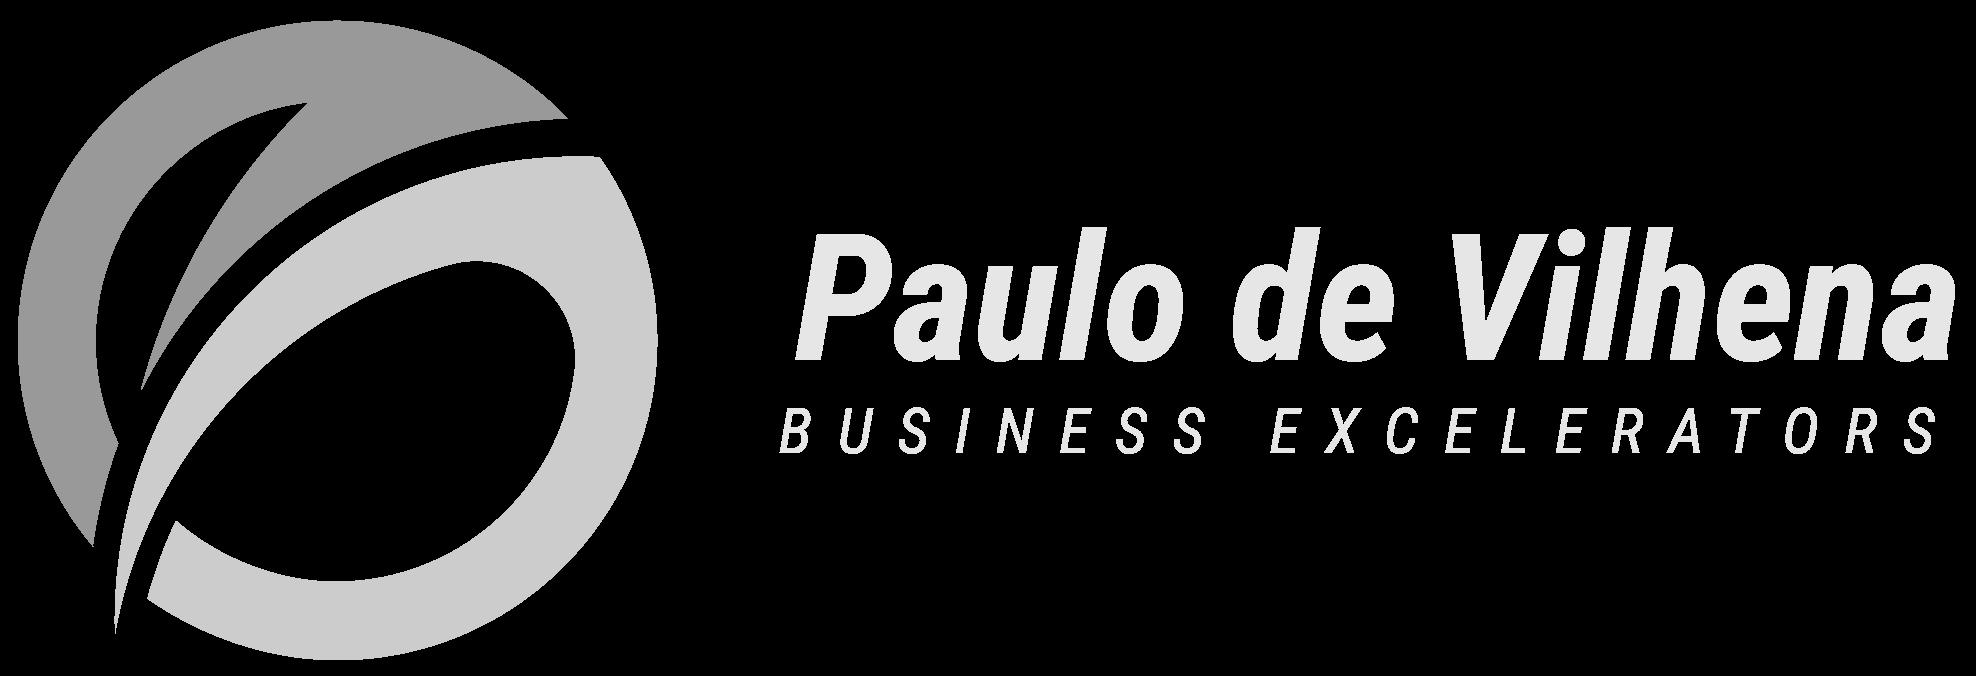 logo-paulo-de-vilhena-final-horizontal-white